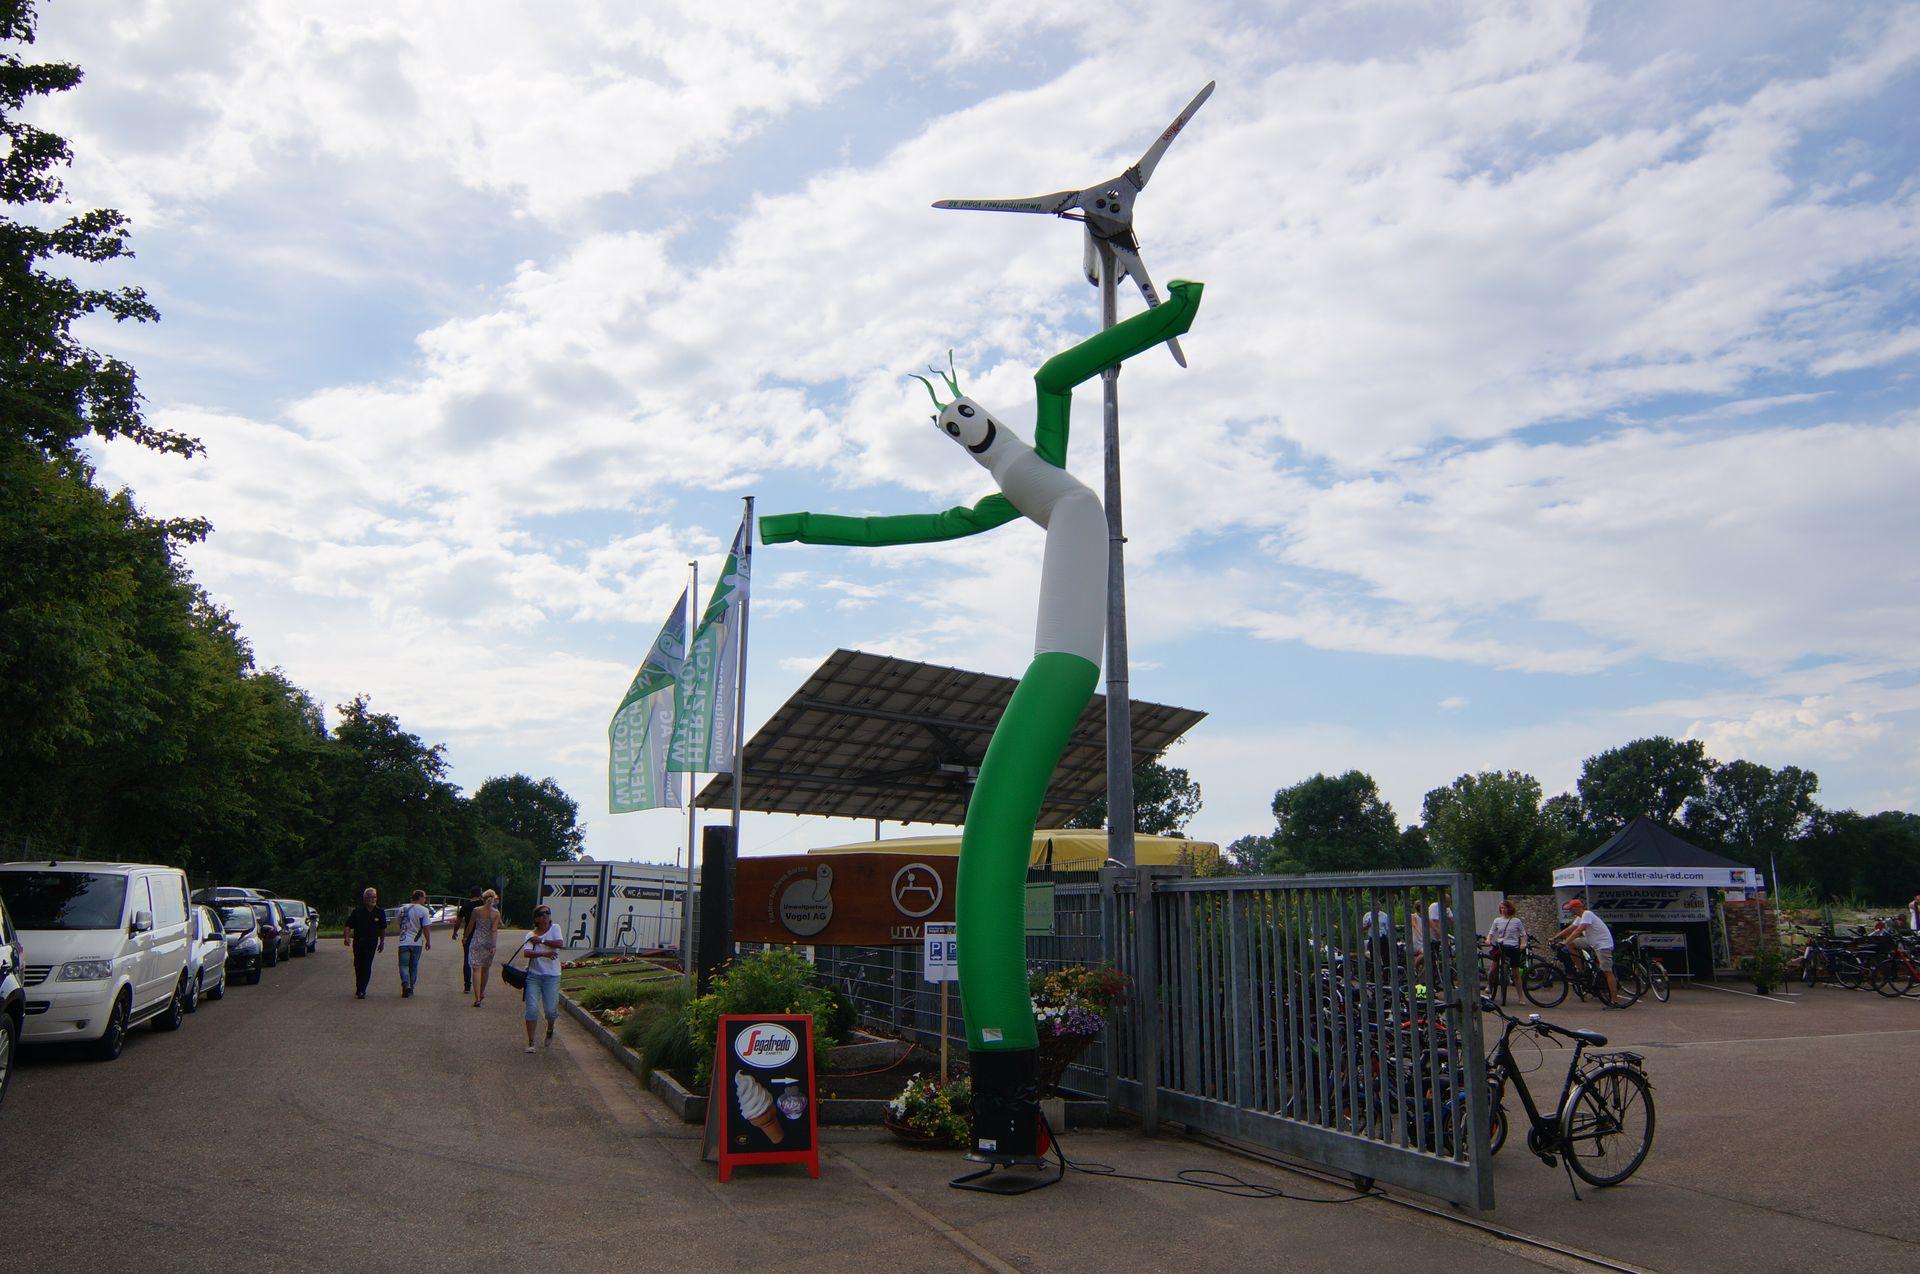 Eingang, Jubiläum, 30 Jahre Kompost, skydancer